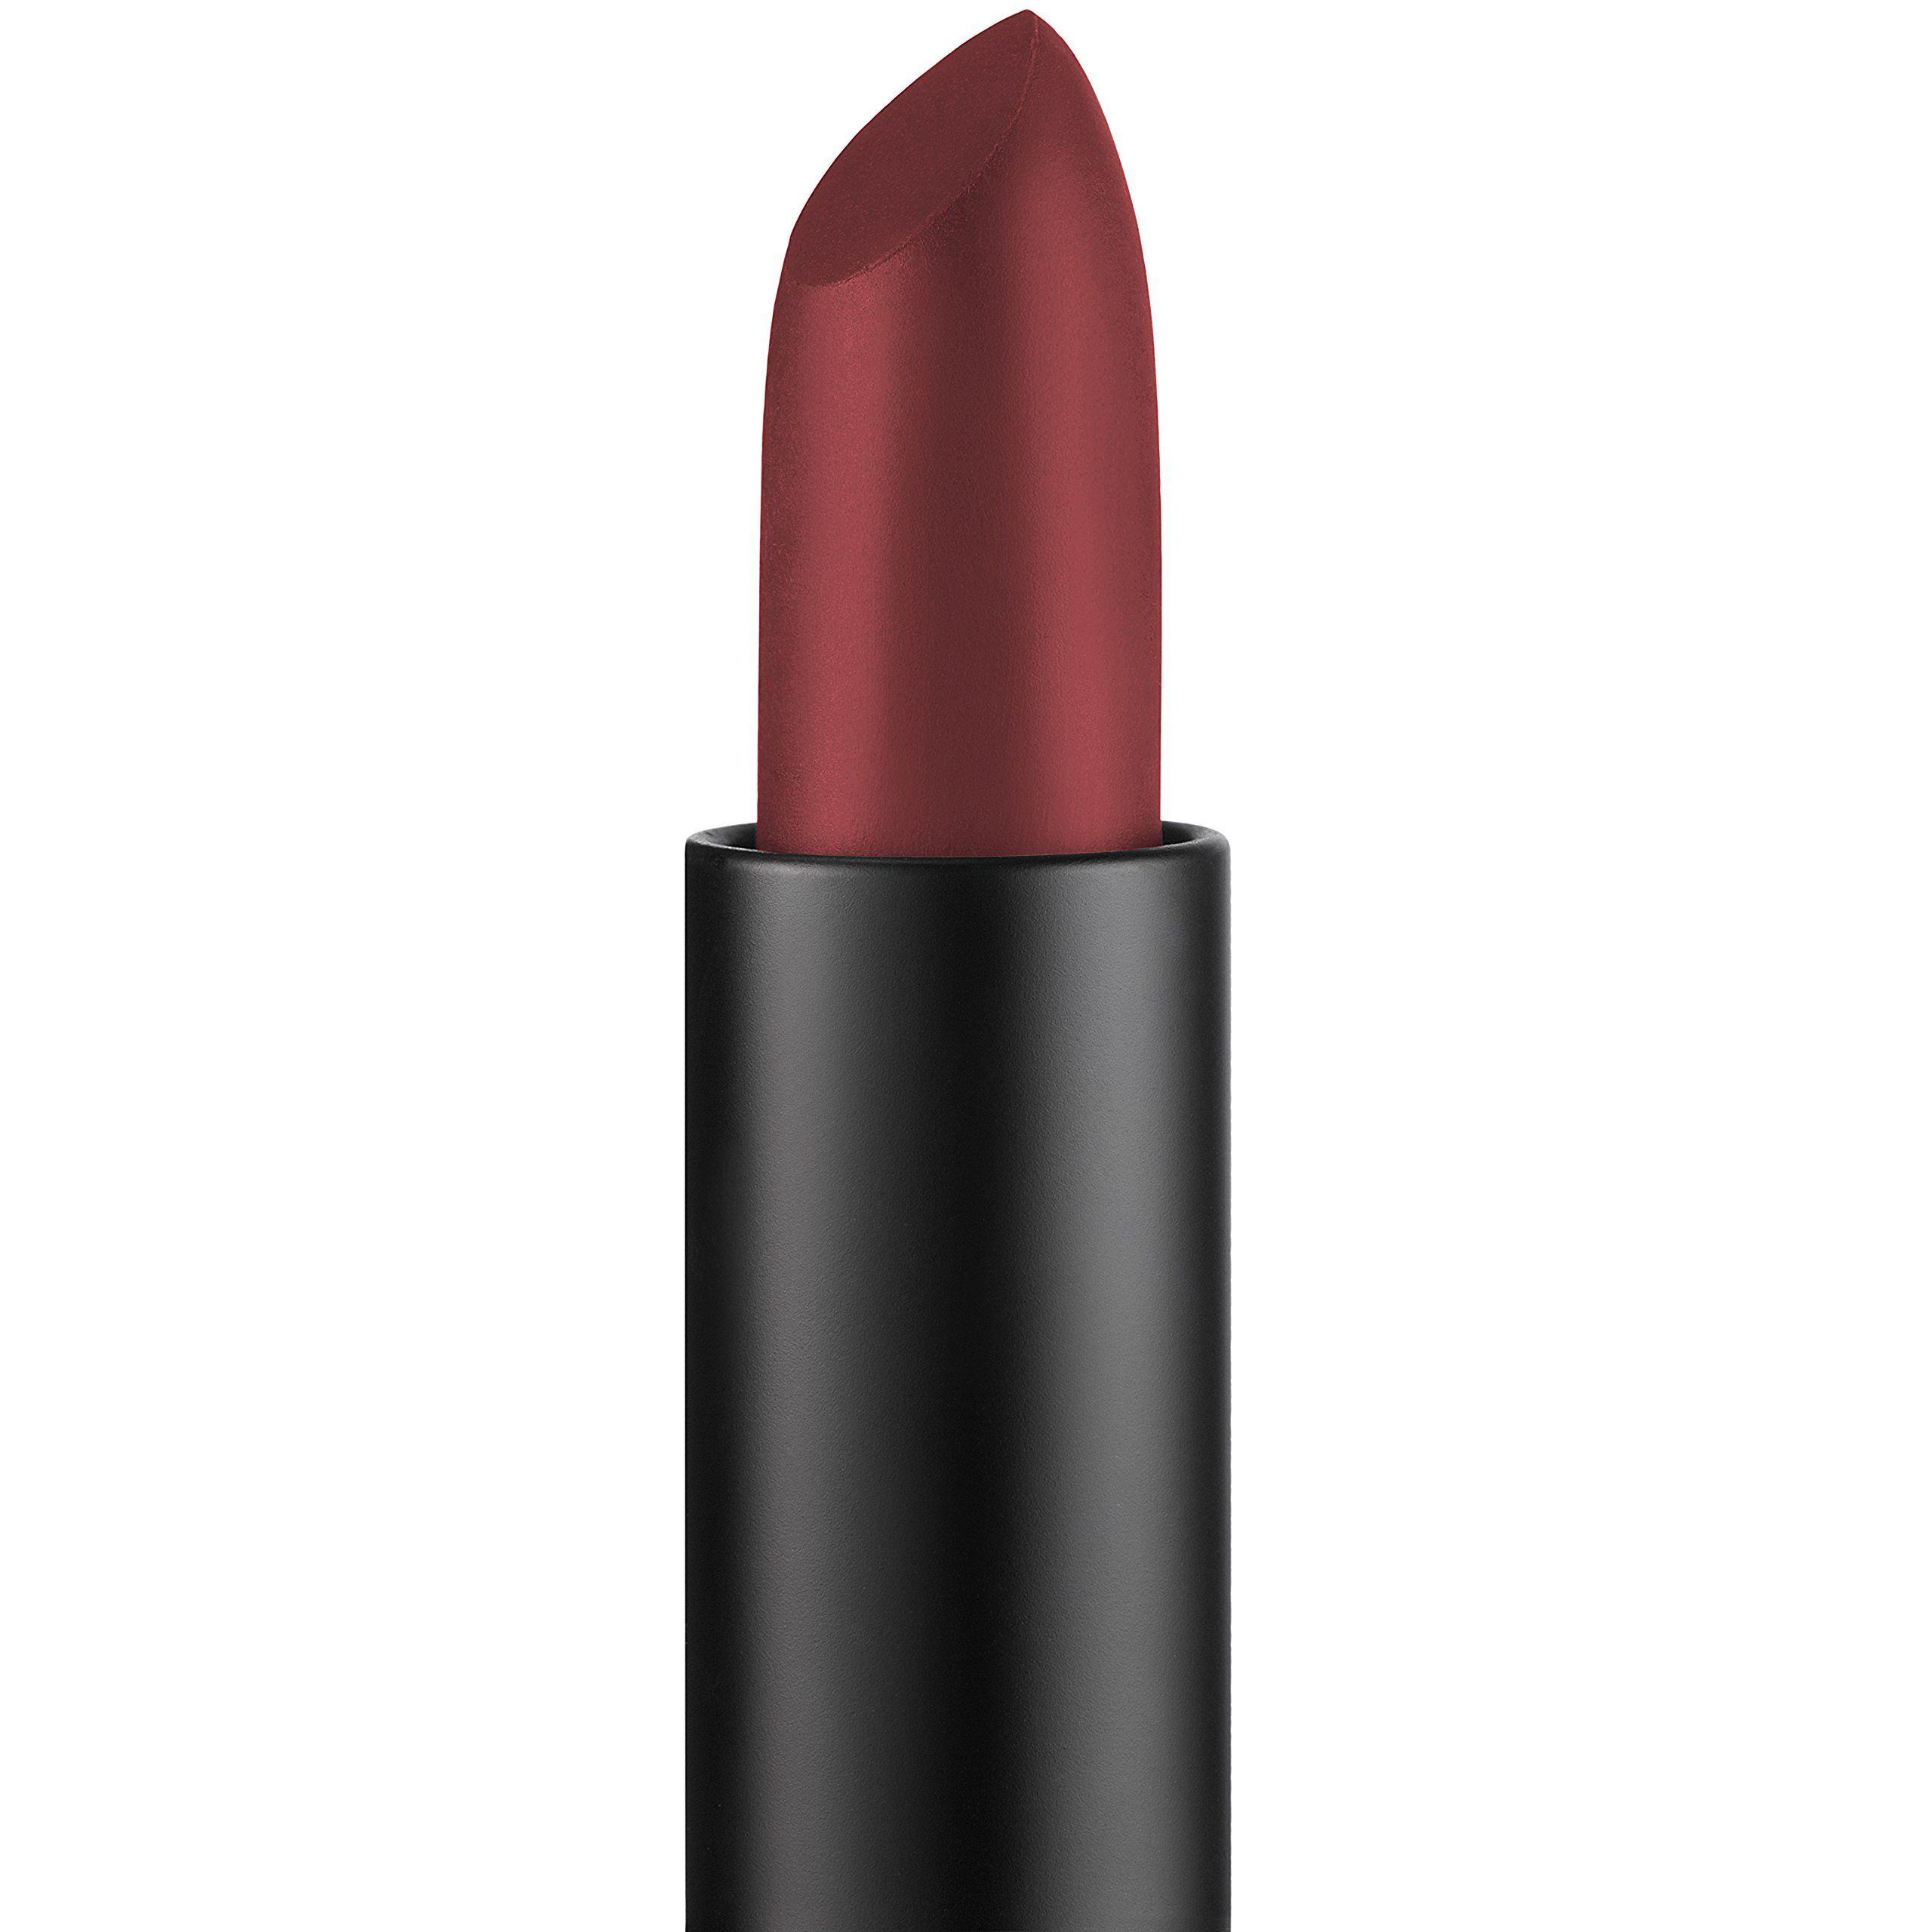 Maybelline Color Sensational Powder Matte Lipstick Cruel Ruby 0 15 Oz More Info Maybelline Color Sensational Matte Powder Matte Lipstick Maybelline Color